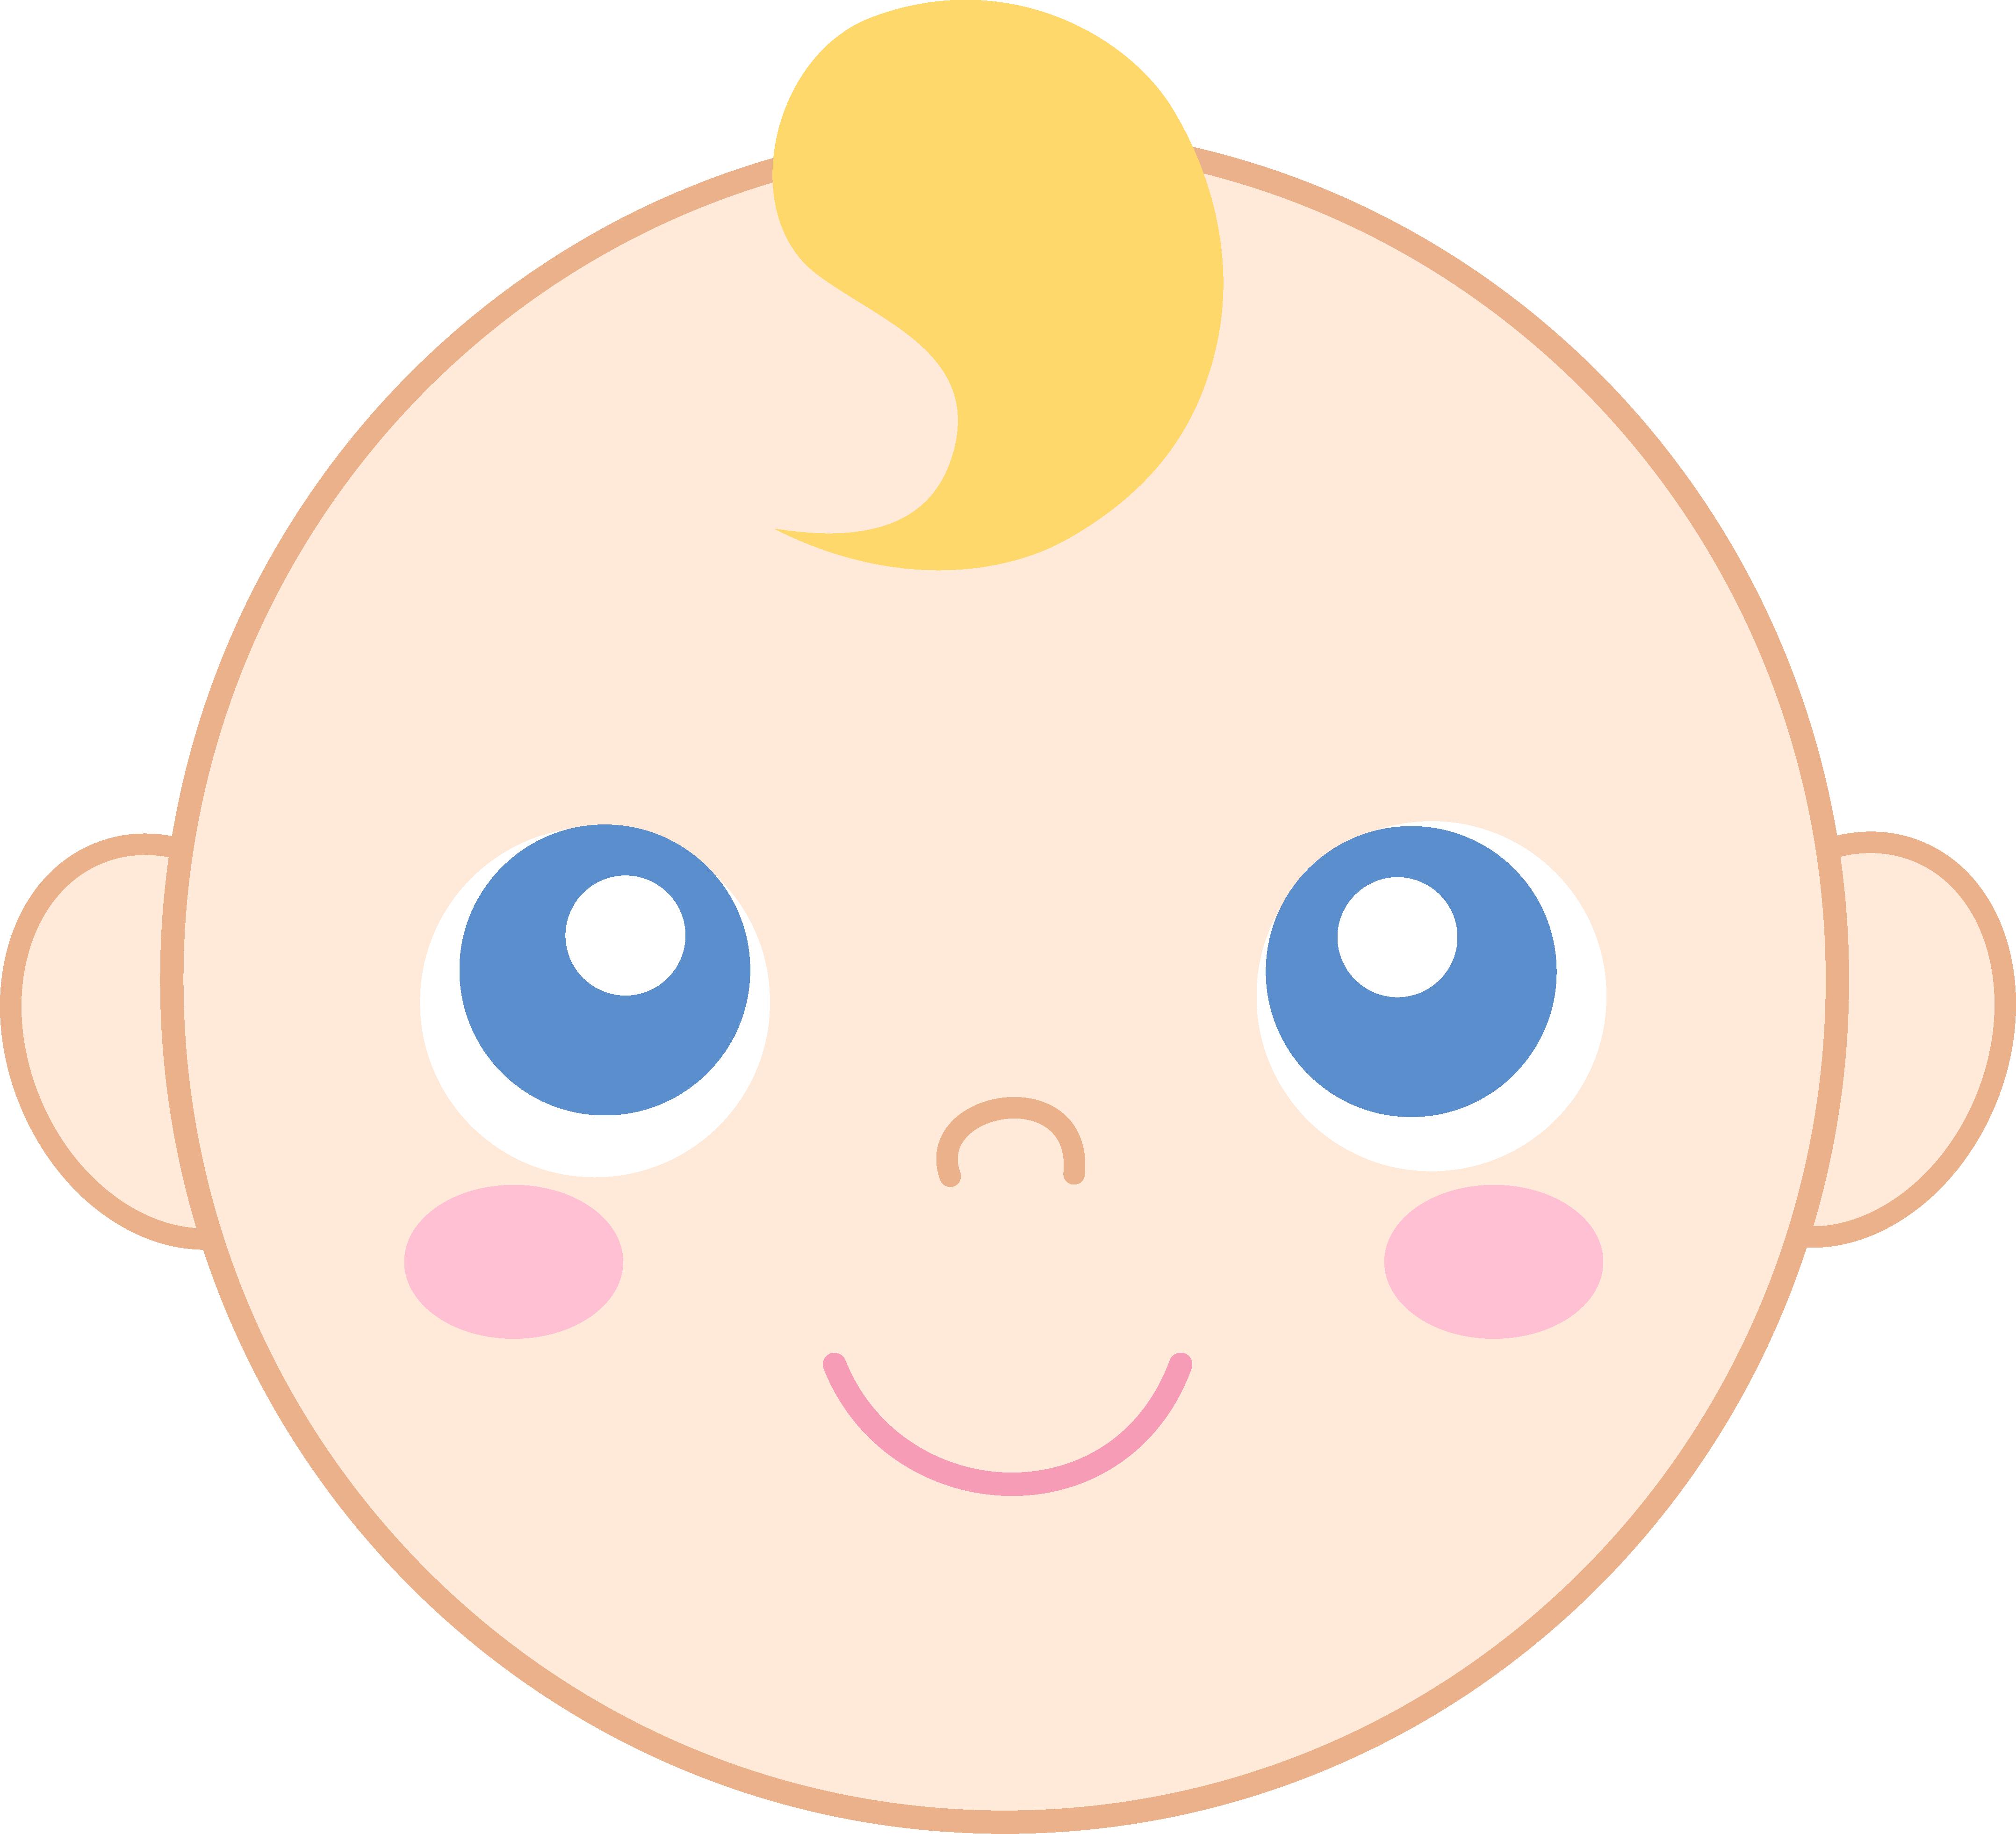 Baby car clipart vector library library Cute Baby Face Clipart - Free Clip Art vector library library